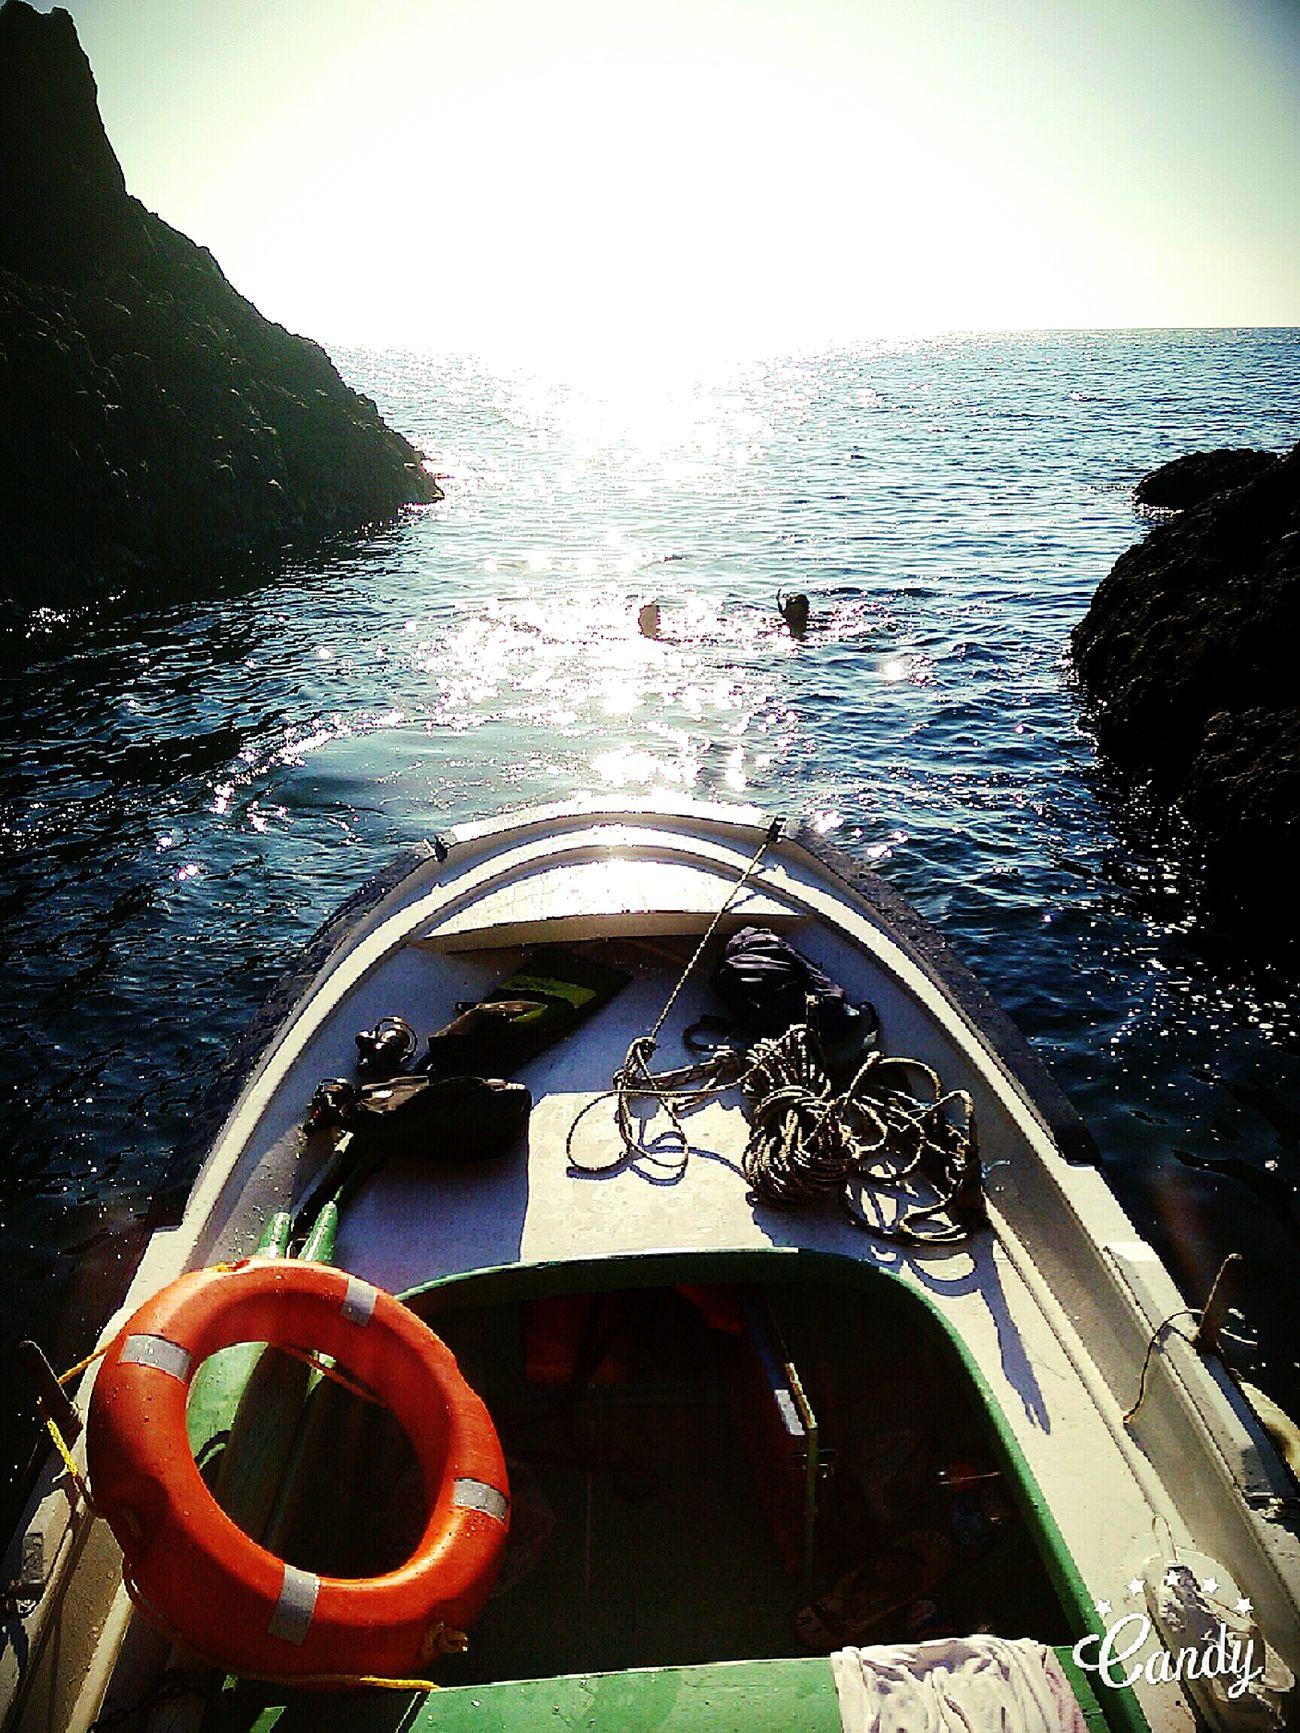 Canal Marin Ship Boats Boat Marina Cheese! Baysakal Cressi Doğa Paradise Zıpkıncı EyeEm Best Shots Eye4photography  Buying A Yacht Going Sailing Enjoying The Sun Fresh Air Starting A Trip Relaxing Hi! Yacht Rock Check This Out ..🏊💦⚓